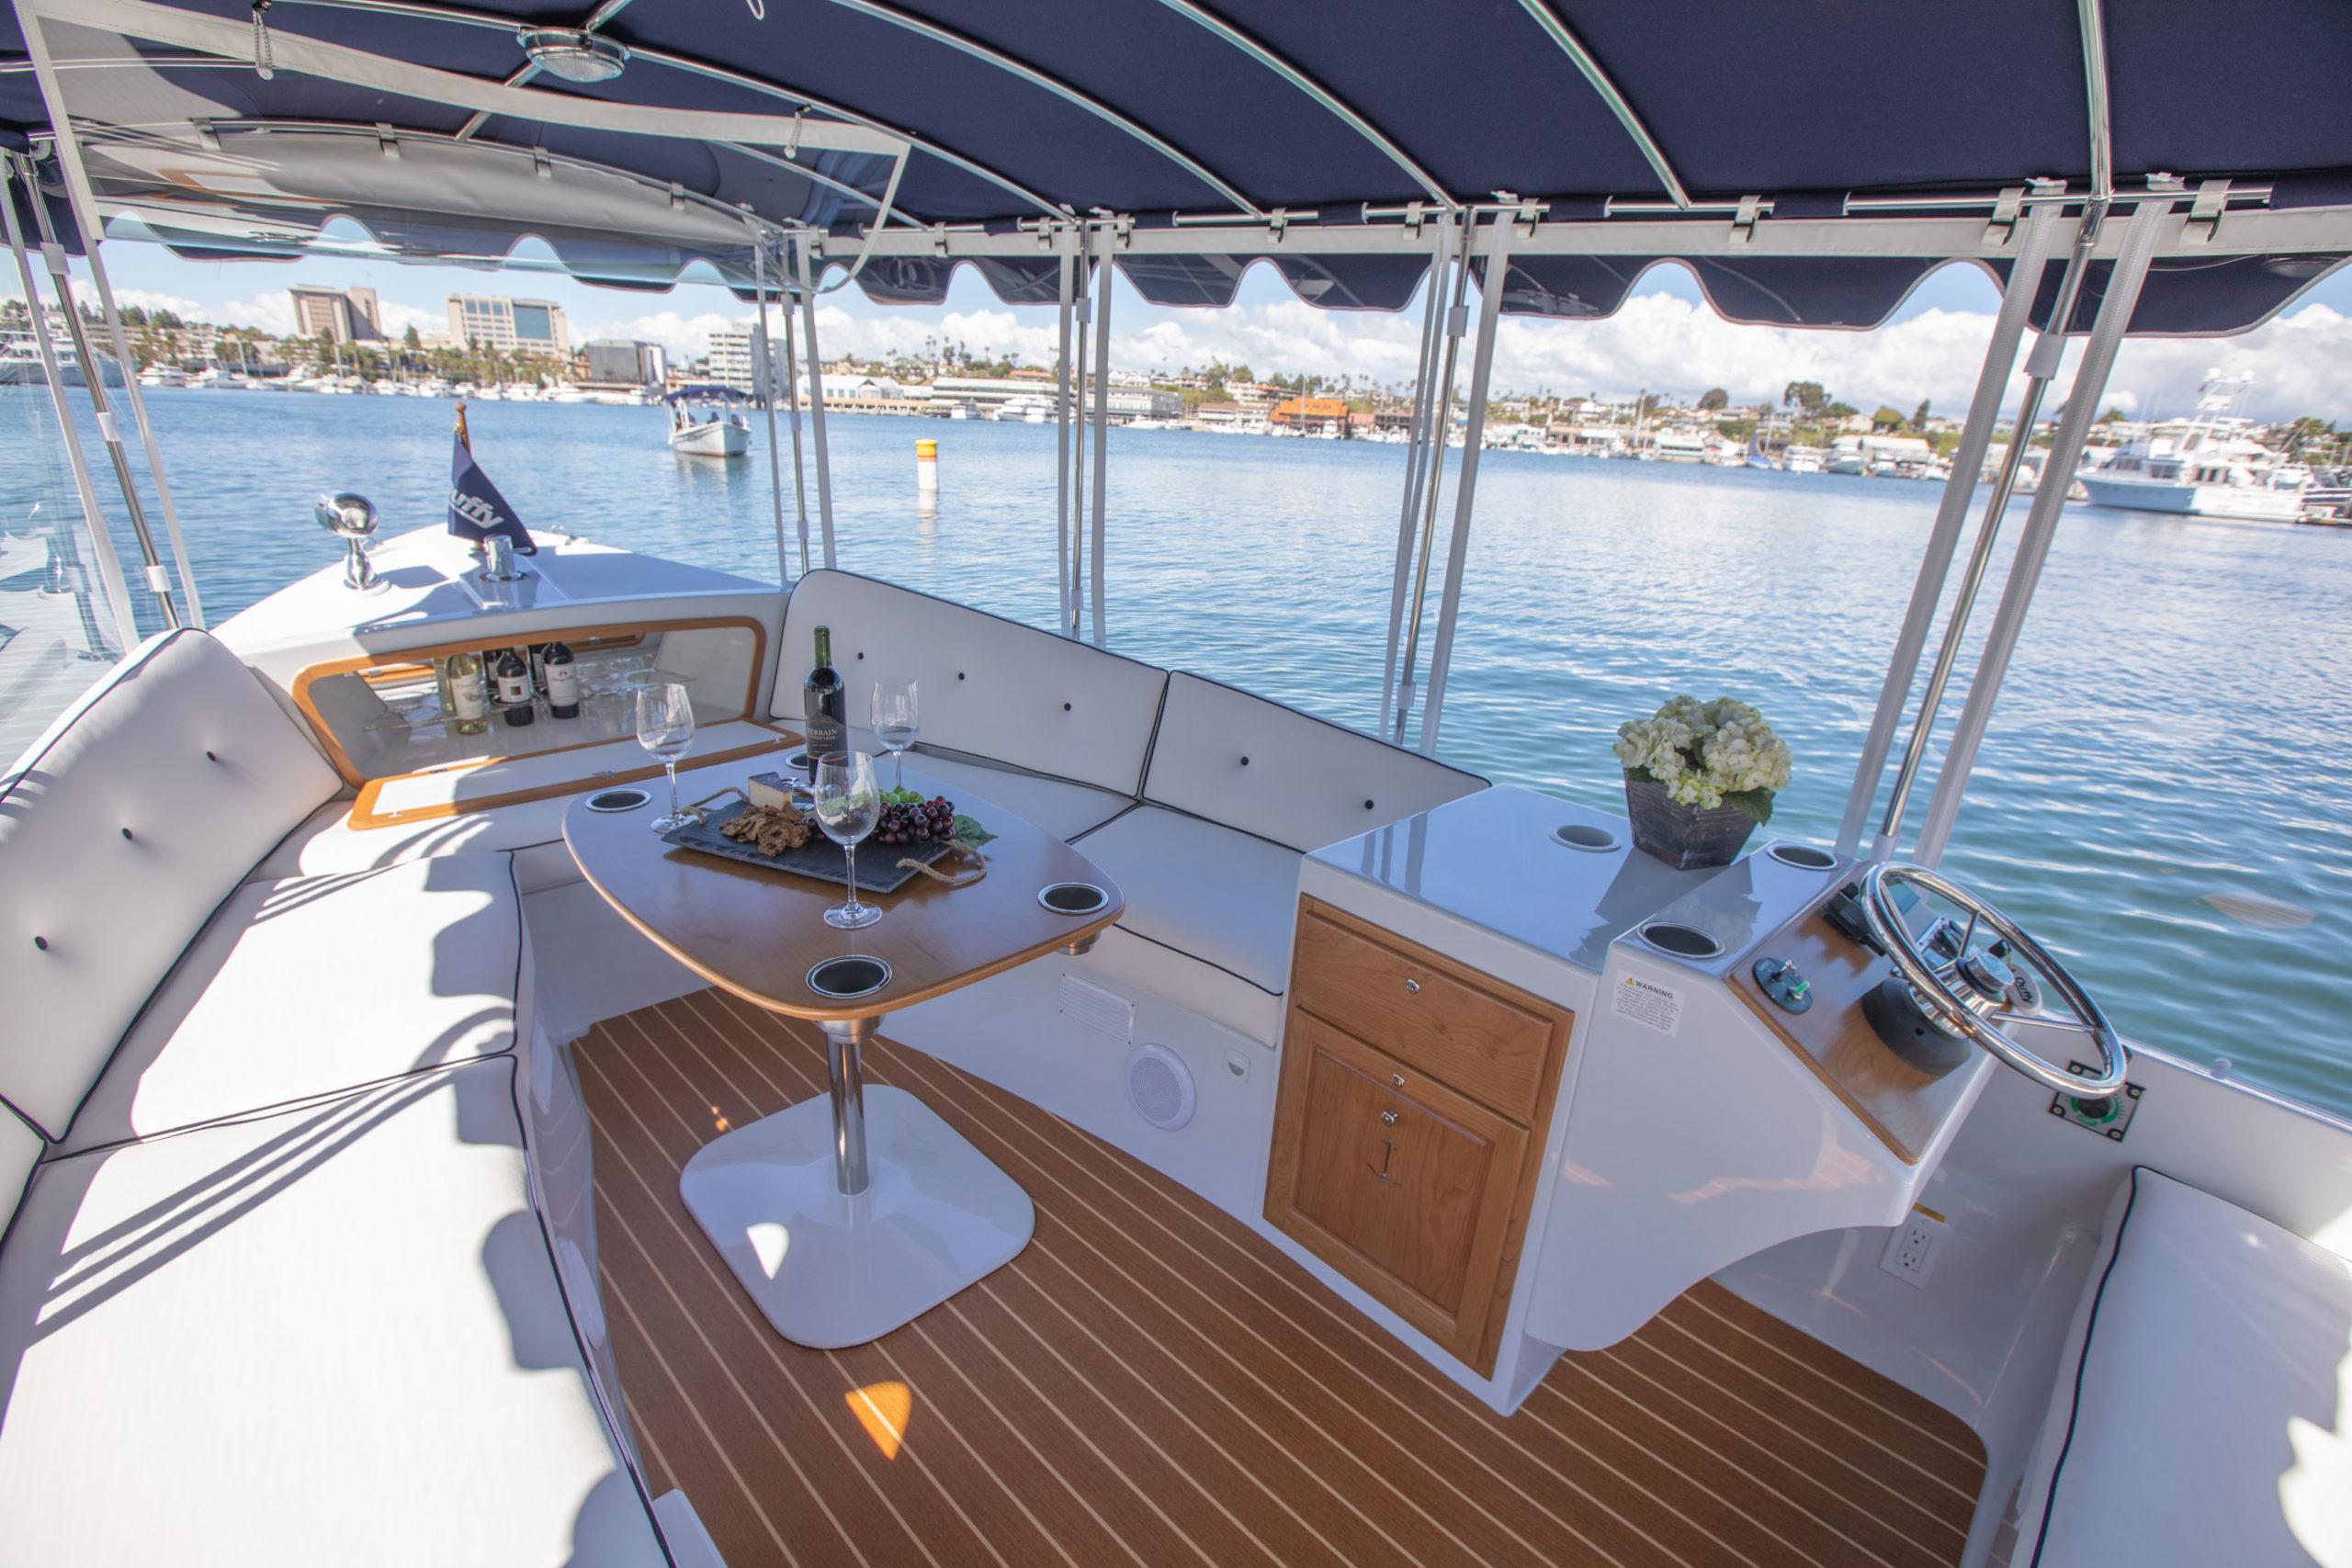 Duffy-Electric-Boats-22-Sun-Cruiser-Interior-2020-13